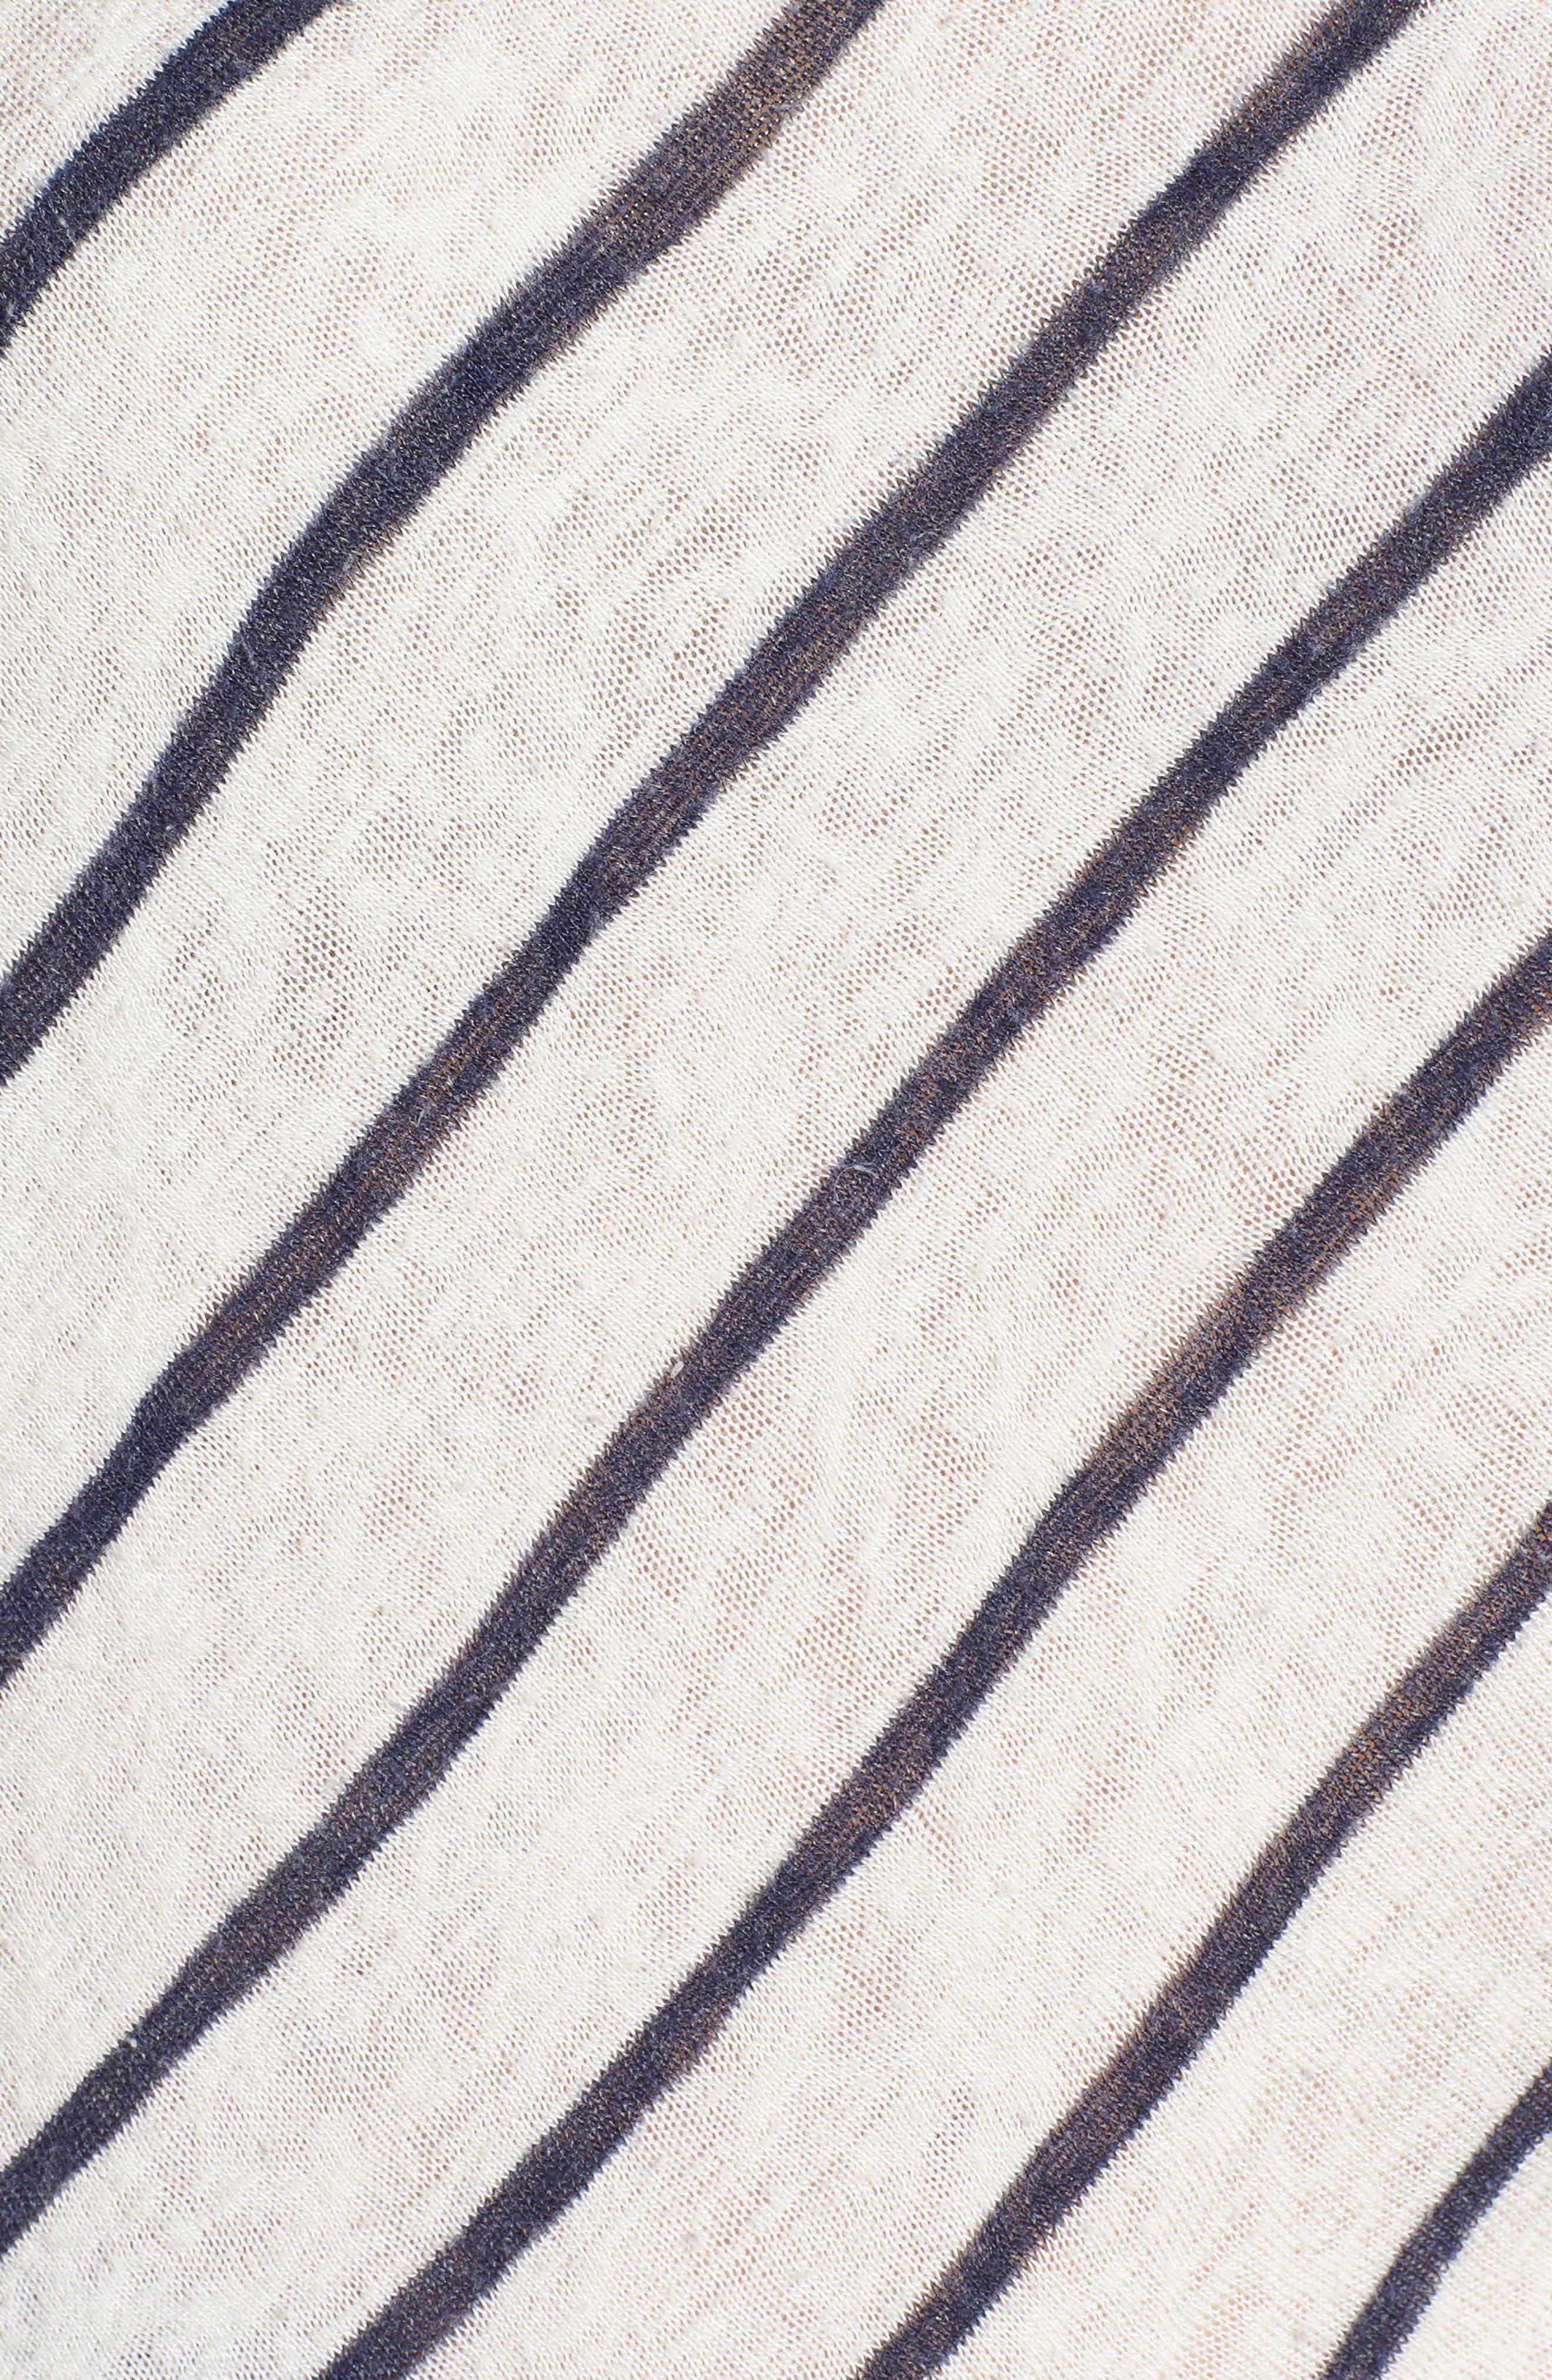 Stripe Dolman Sleeve Top,                             Alternate thumbnail 6, color,                             195